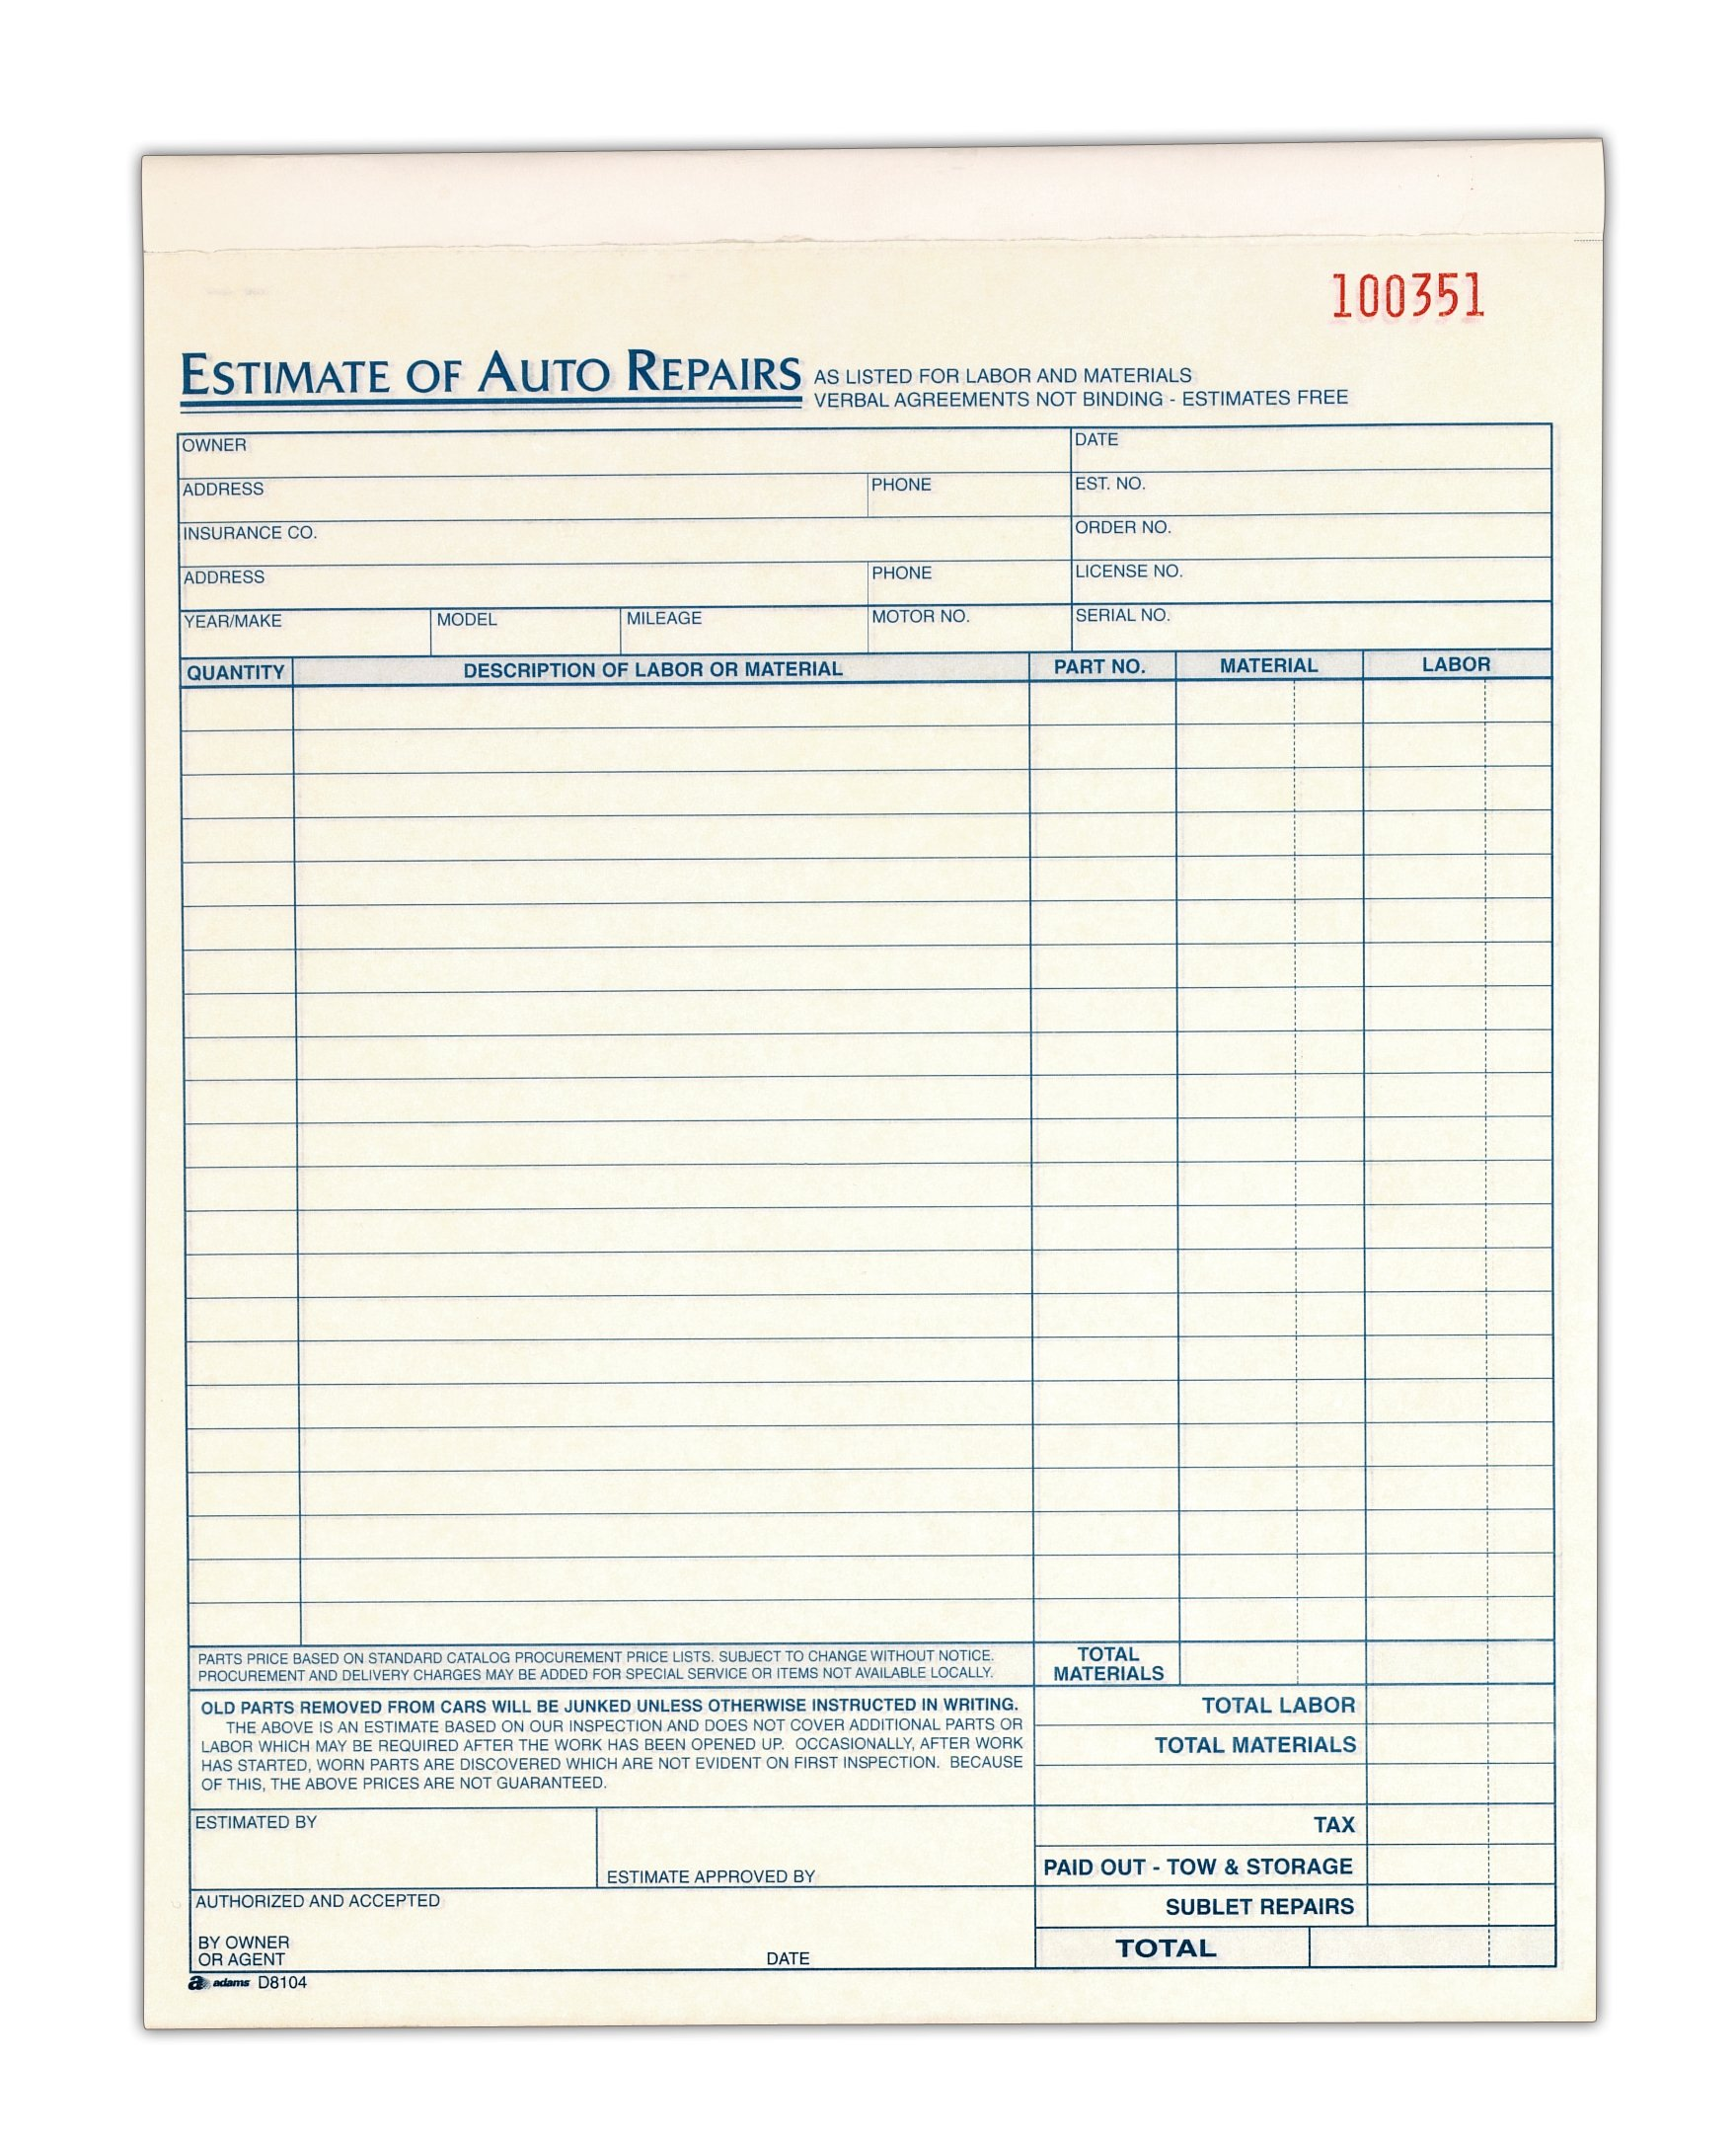 Get Car Insurance Estimate